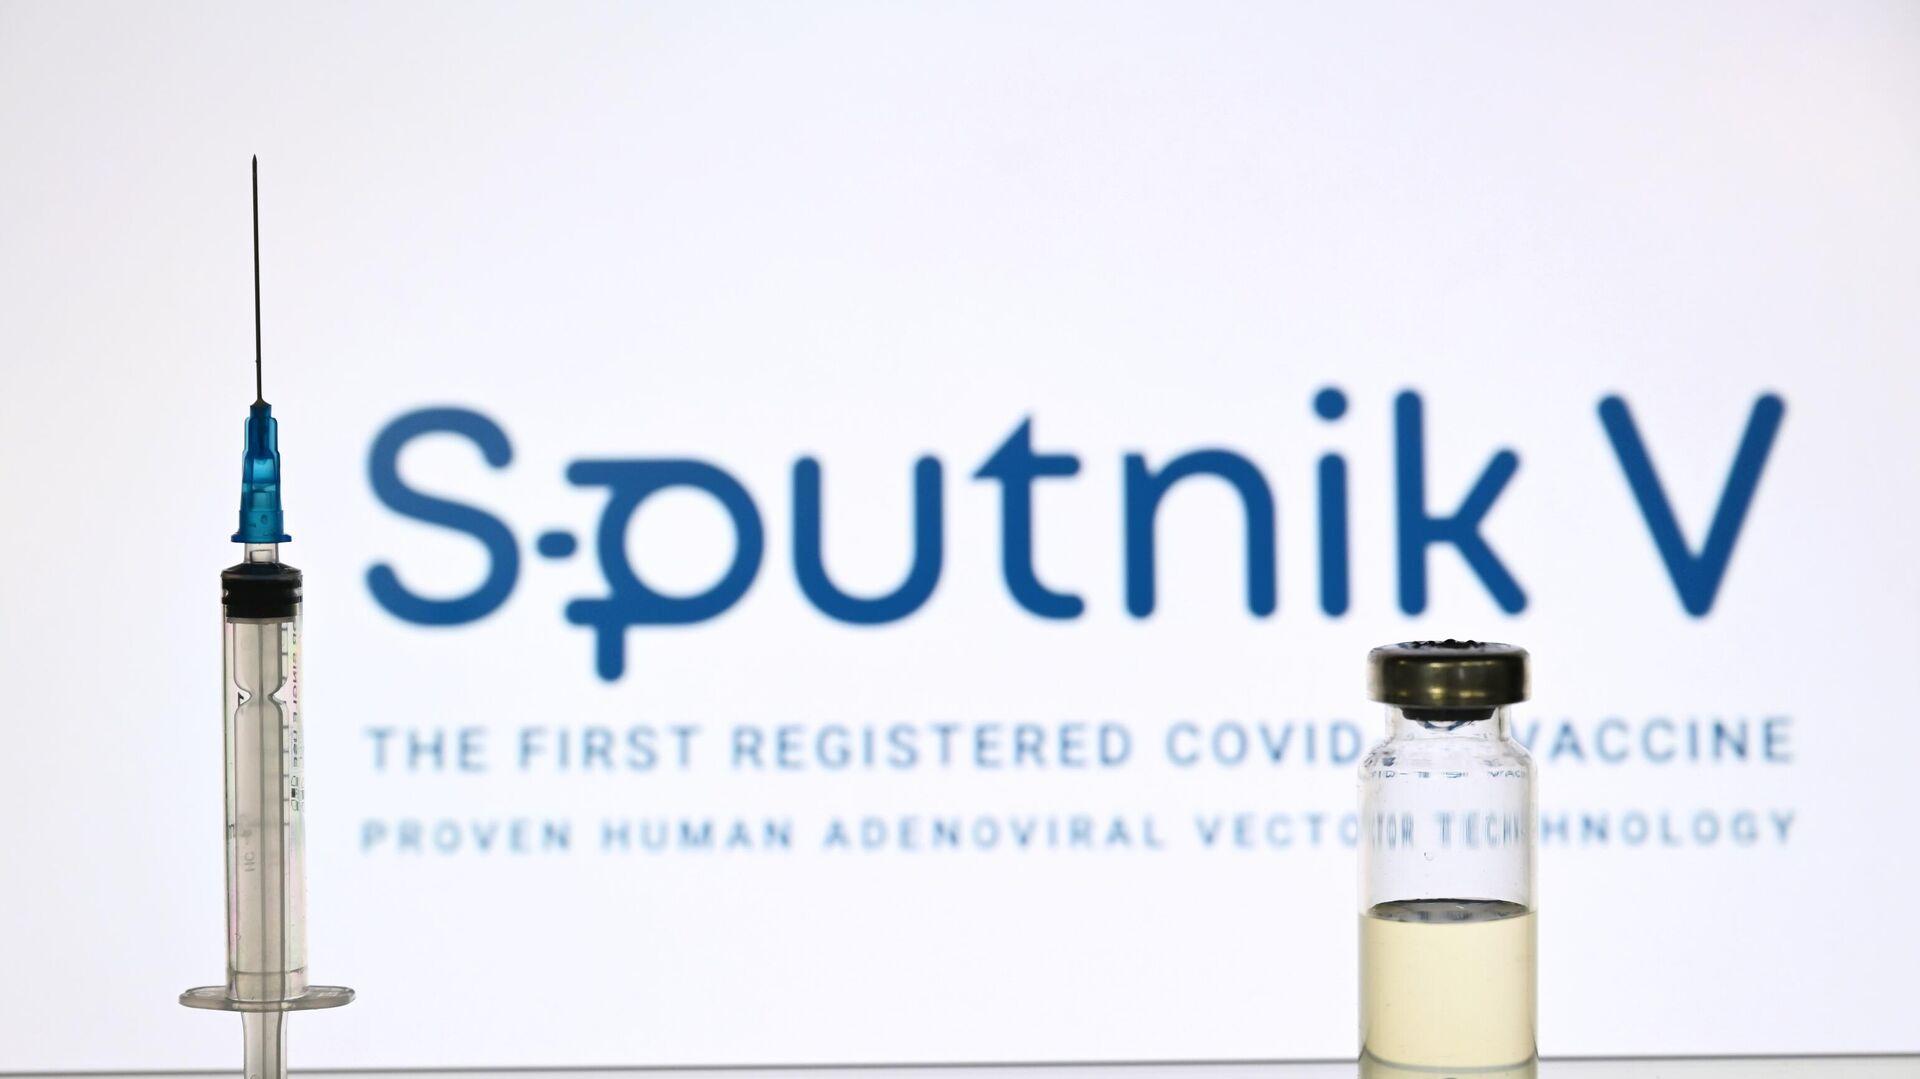 La vacuna contra el coronavirus Sputnik V - Sputnik Mundo, 1920, 26.04.2021